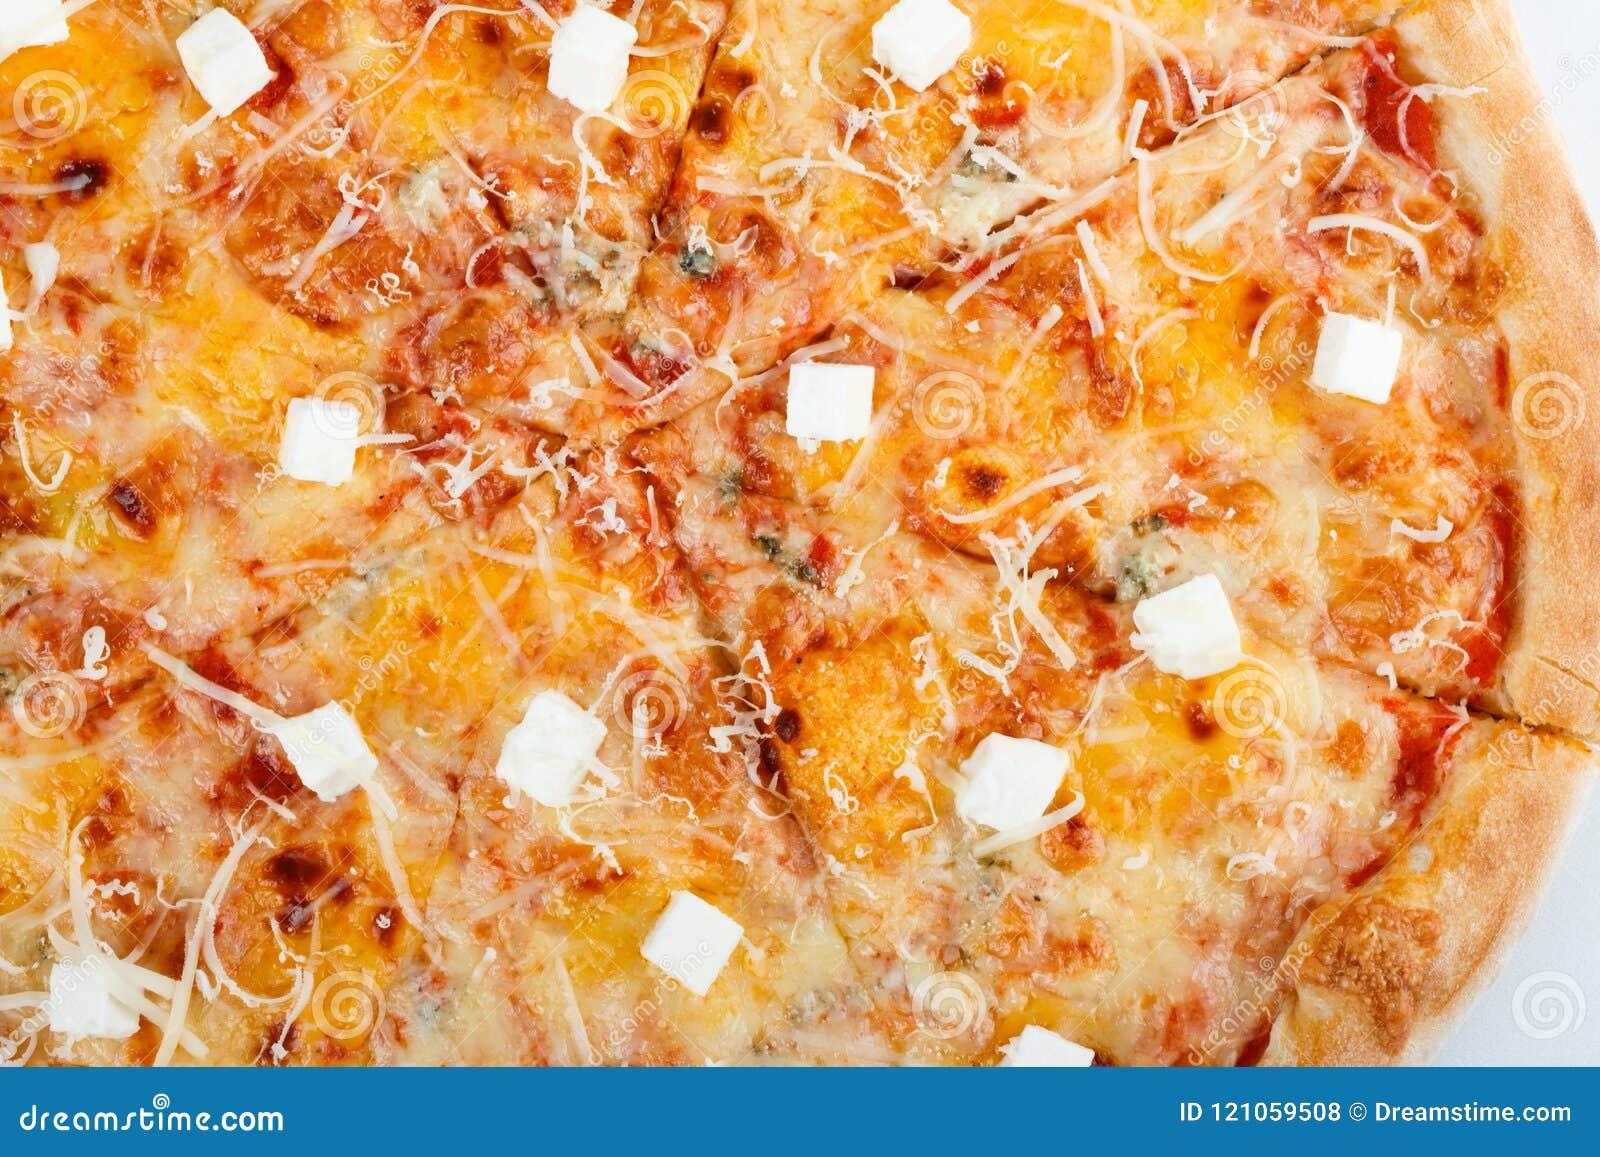 Pizza aus der ganzen Welt bunt, knusperig, geschmackvoll